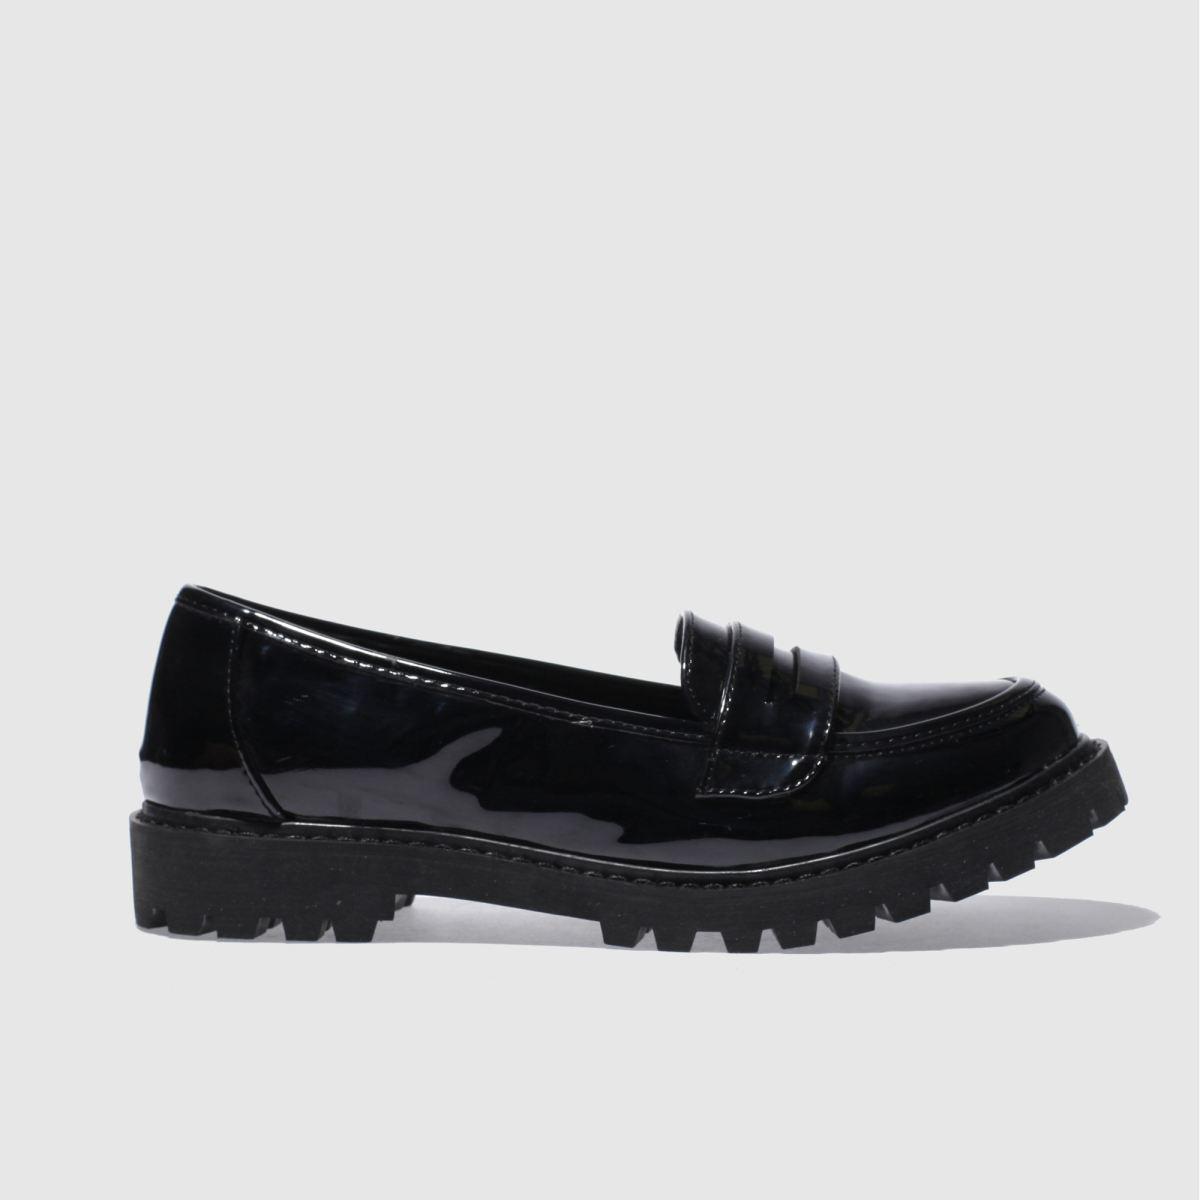 schuh black atlas flat shoes